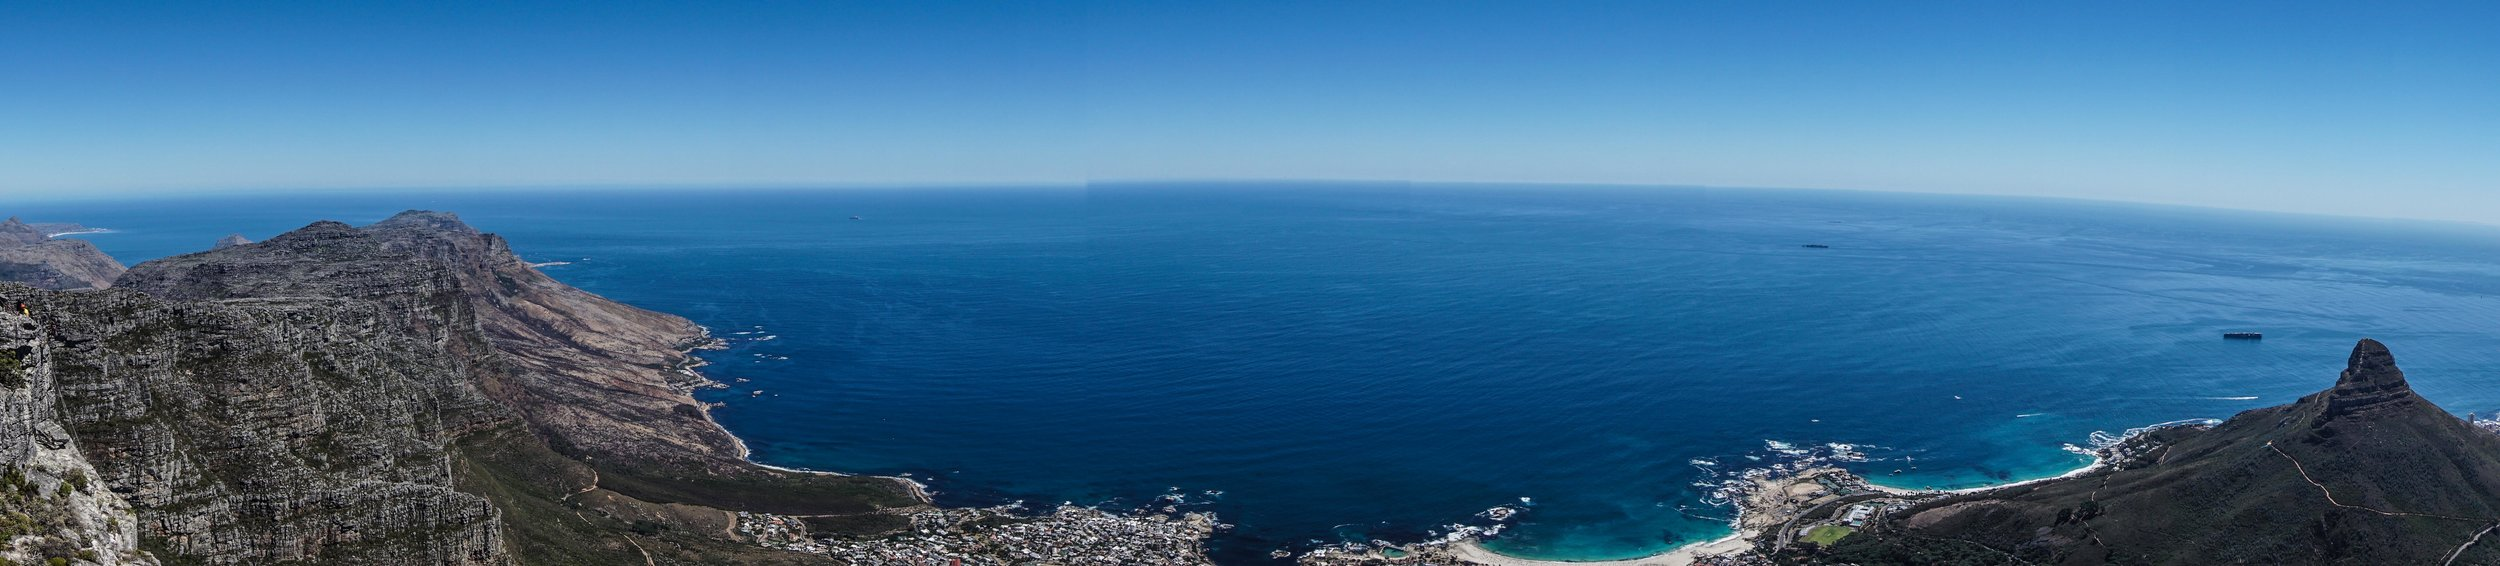 South-Africa-07018.jpg